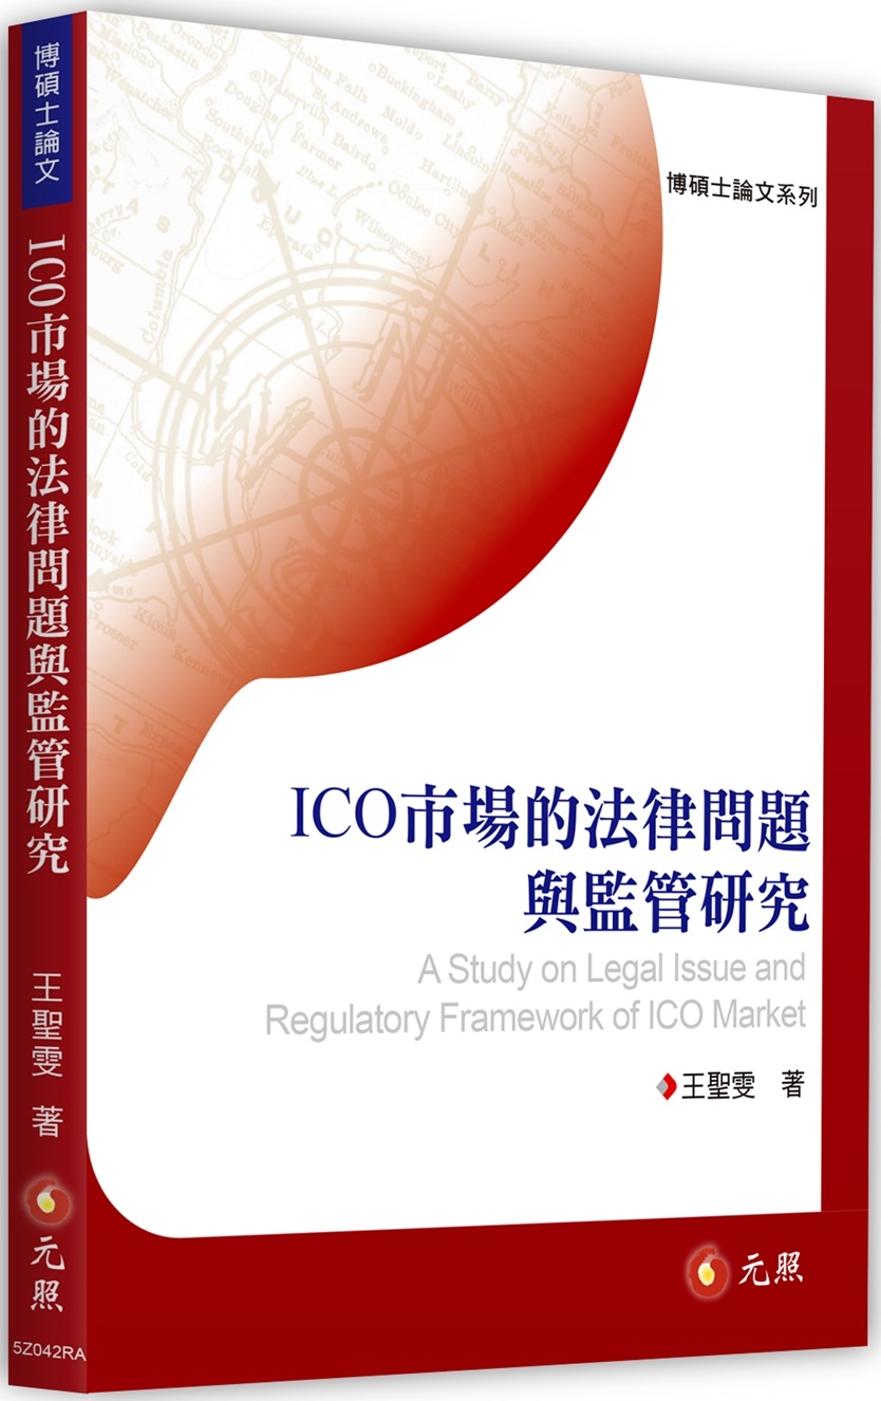 ICO市場的法律問題與監管研究